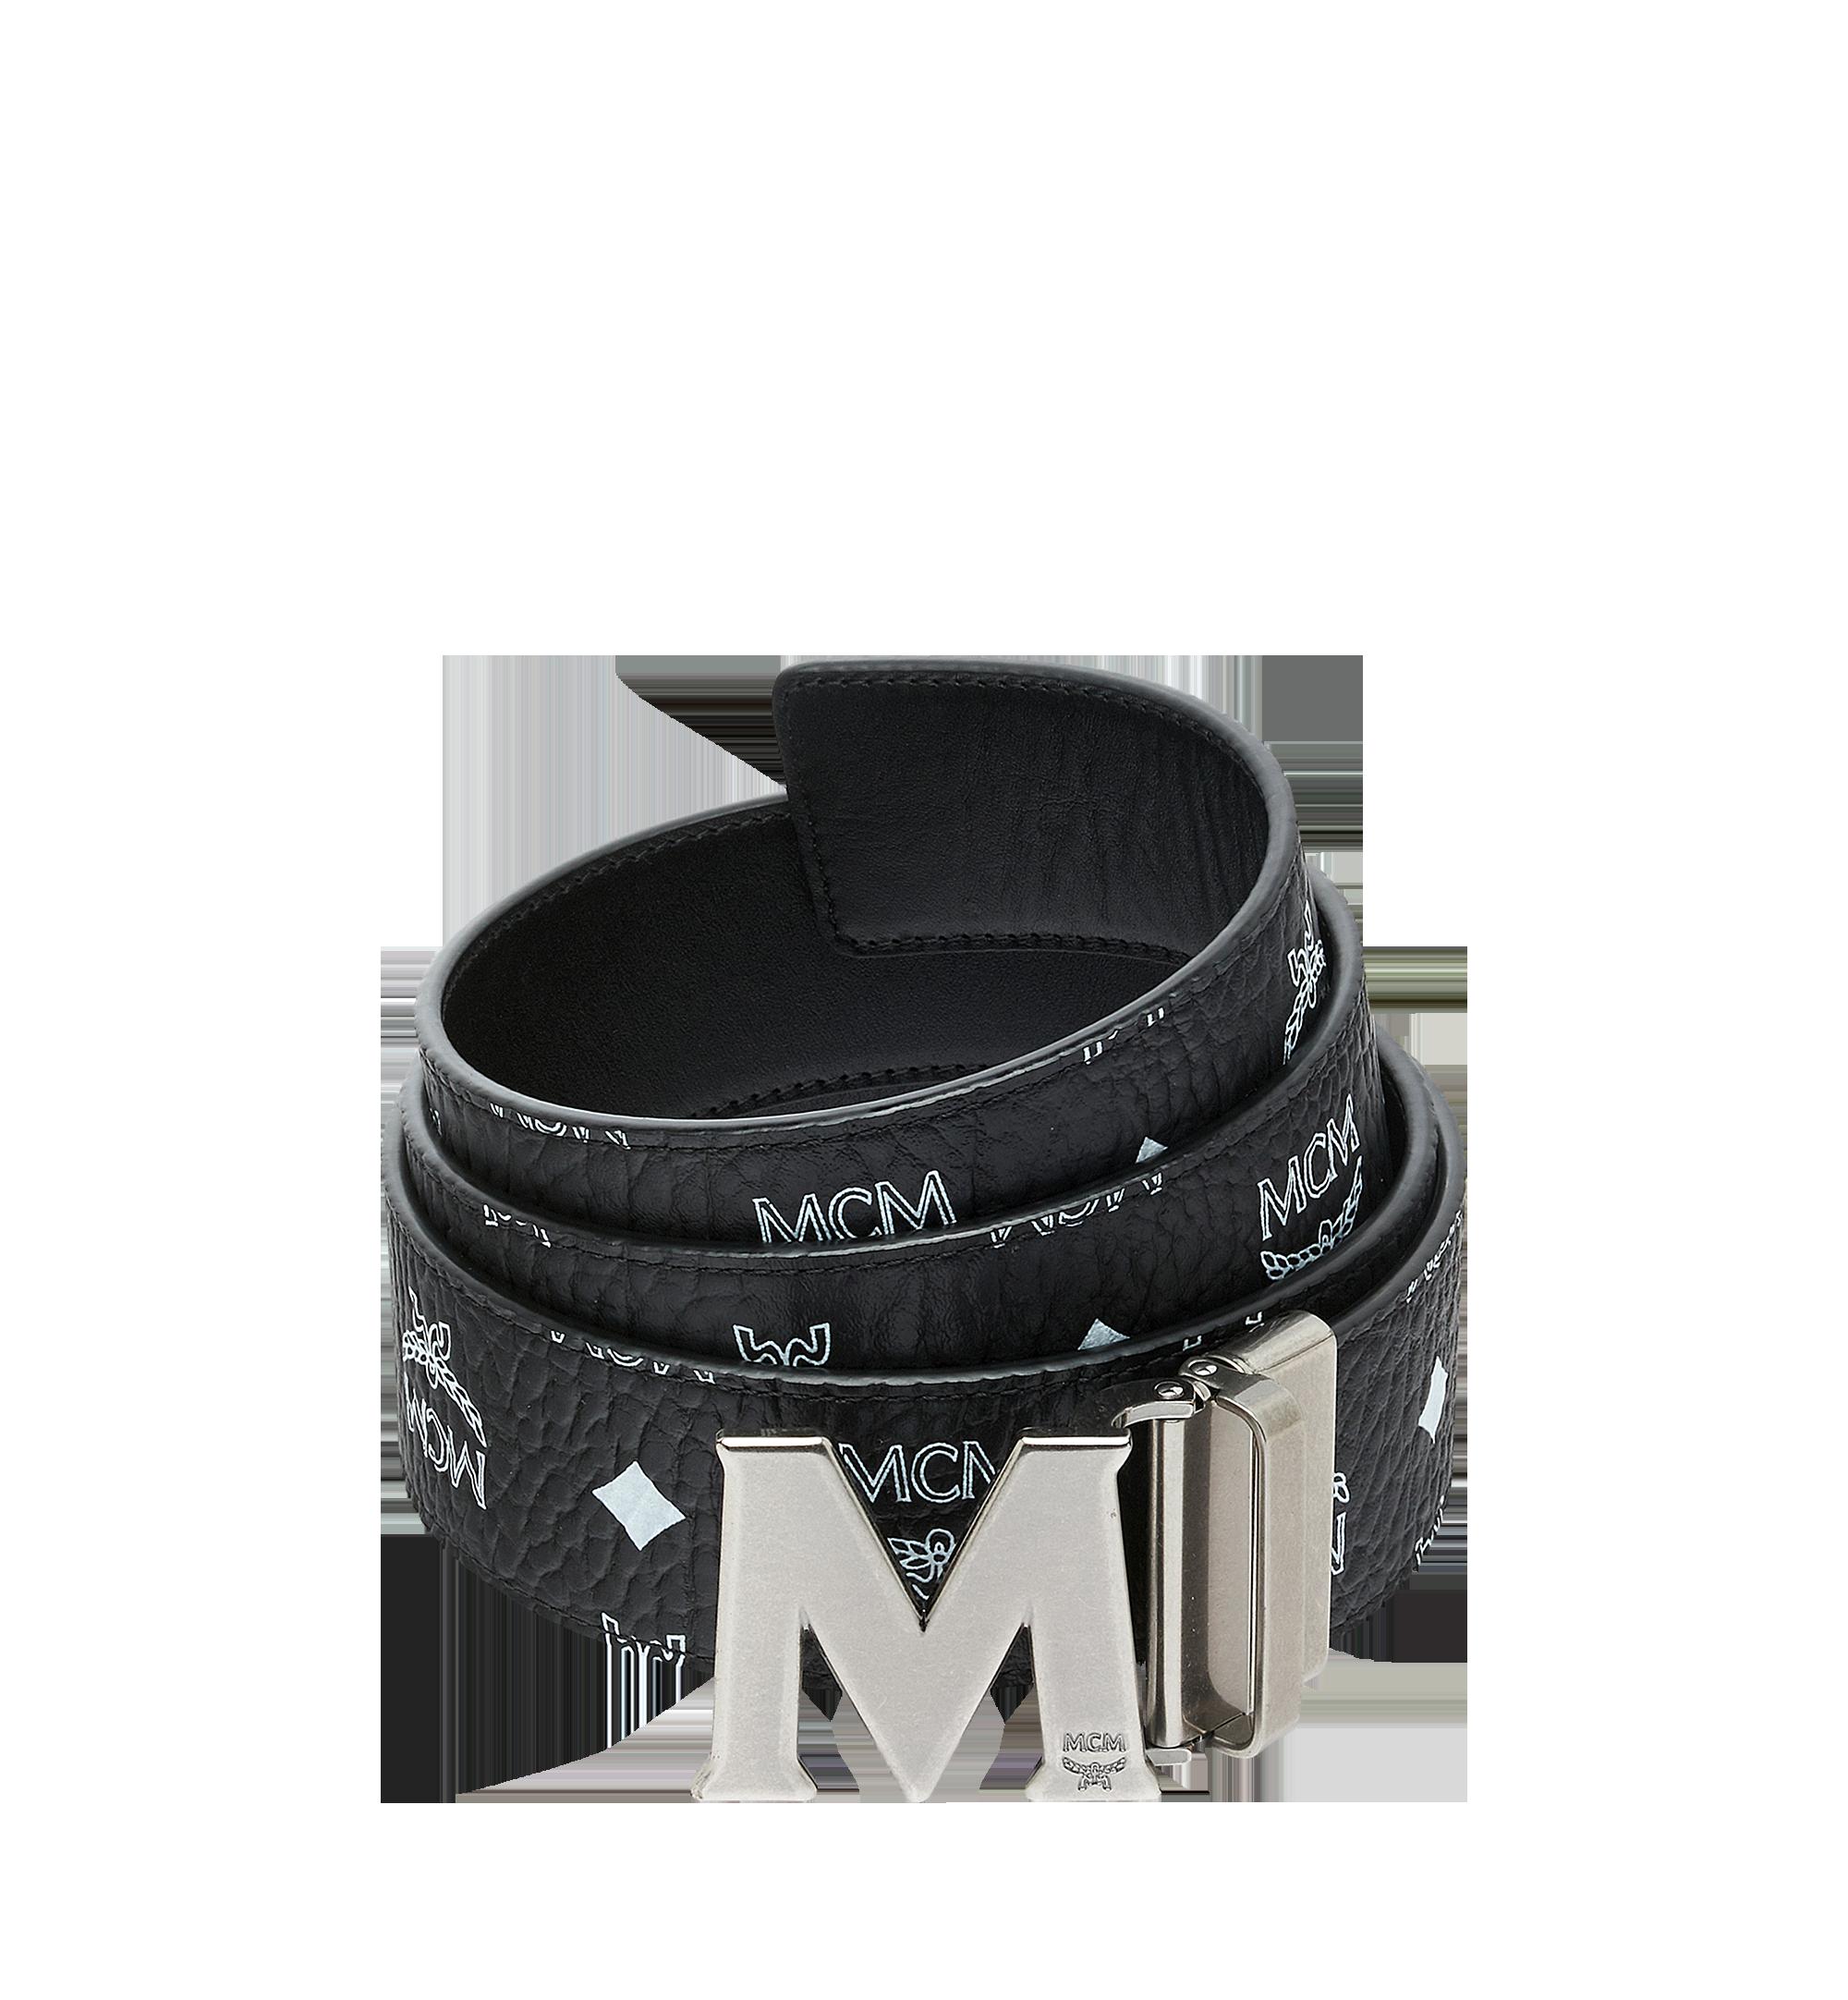 "MCM Antique M Reversible Belt 1.75"" in White Logo  Visetos Black MXB9SVI14BV001 Alternate View 1"